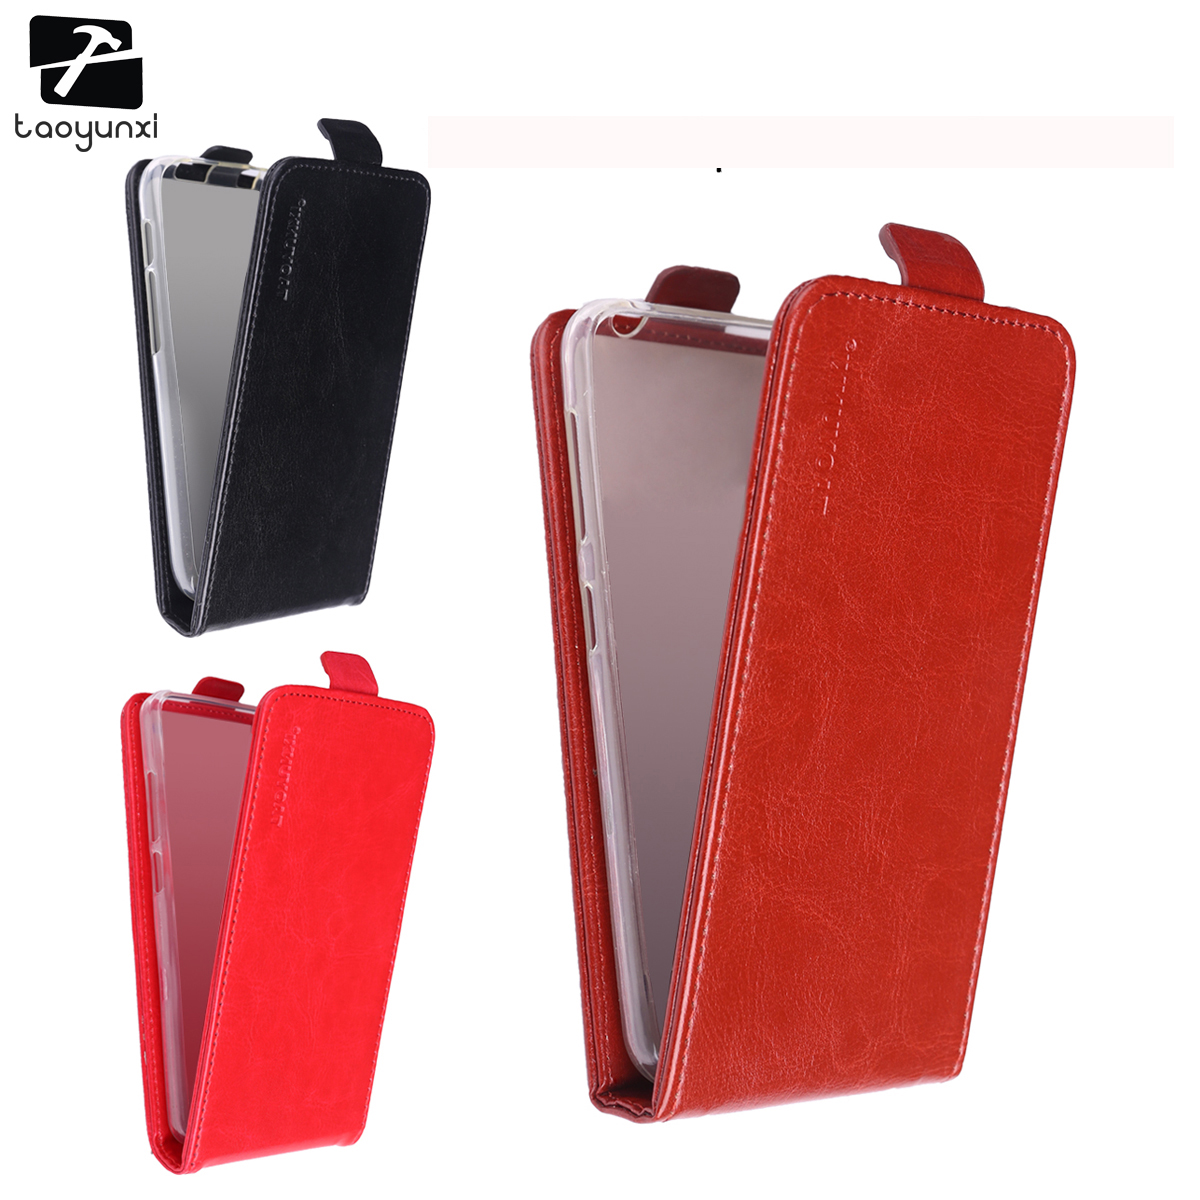 TAOYUNXI PU Leather Phone Cases For Fly IQ4503 quad Era Life 6 IQ 4503 life6 5.0 inch Covers Magnetic Flip Holster